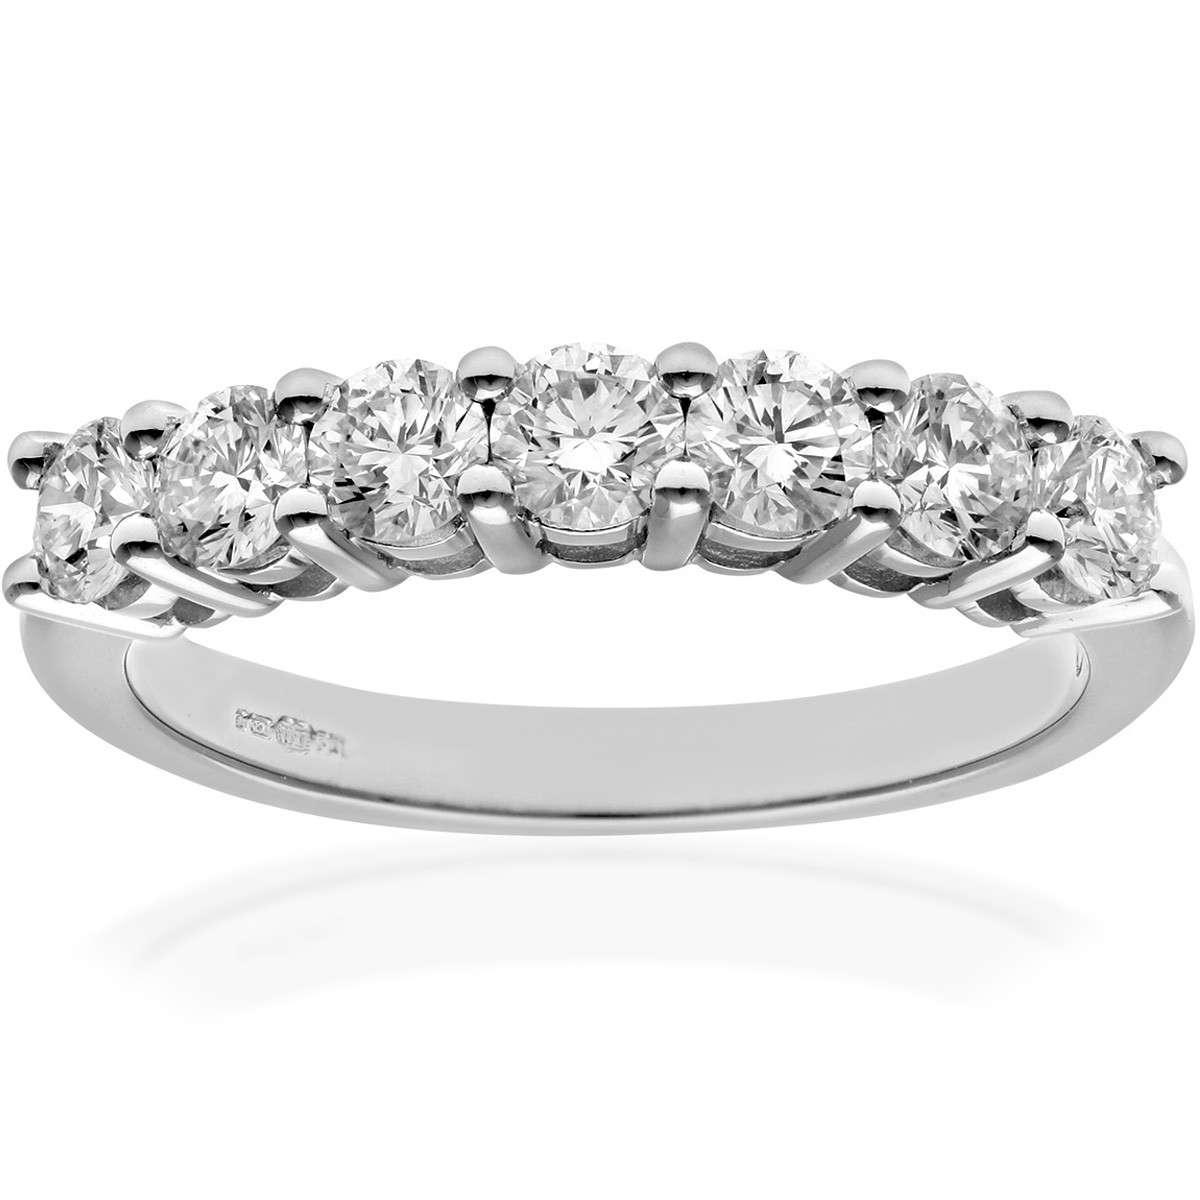 18CT WHITE GOLD 1.00CT DIAMOND 7 STONE 1/2 ETERNITY RING